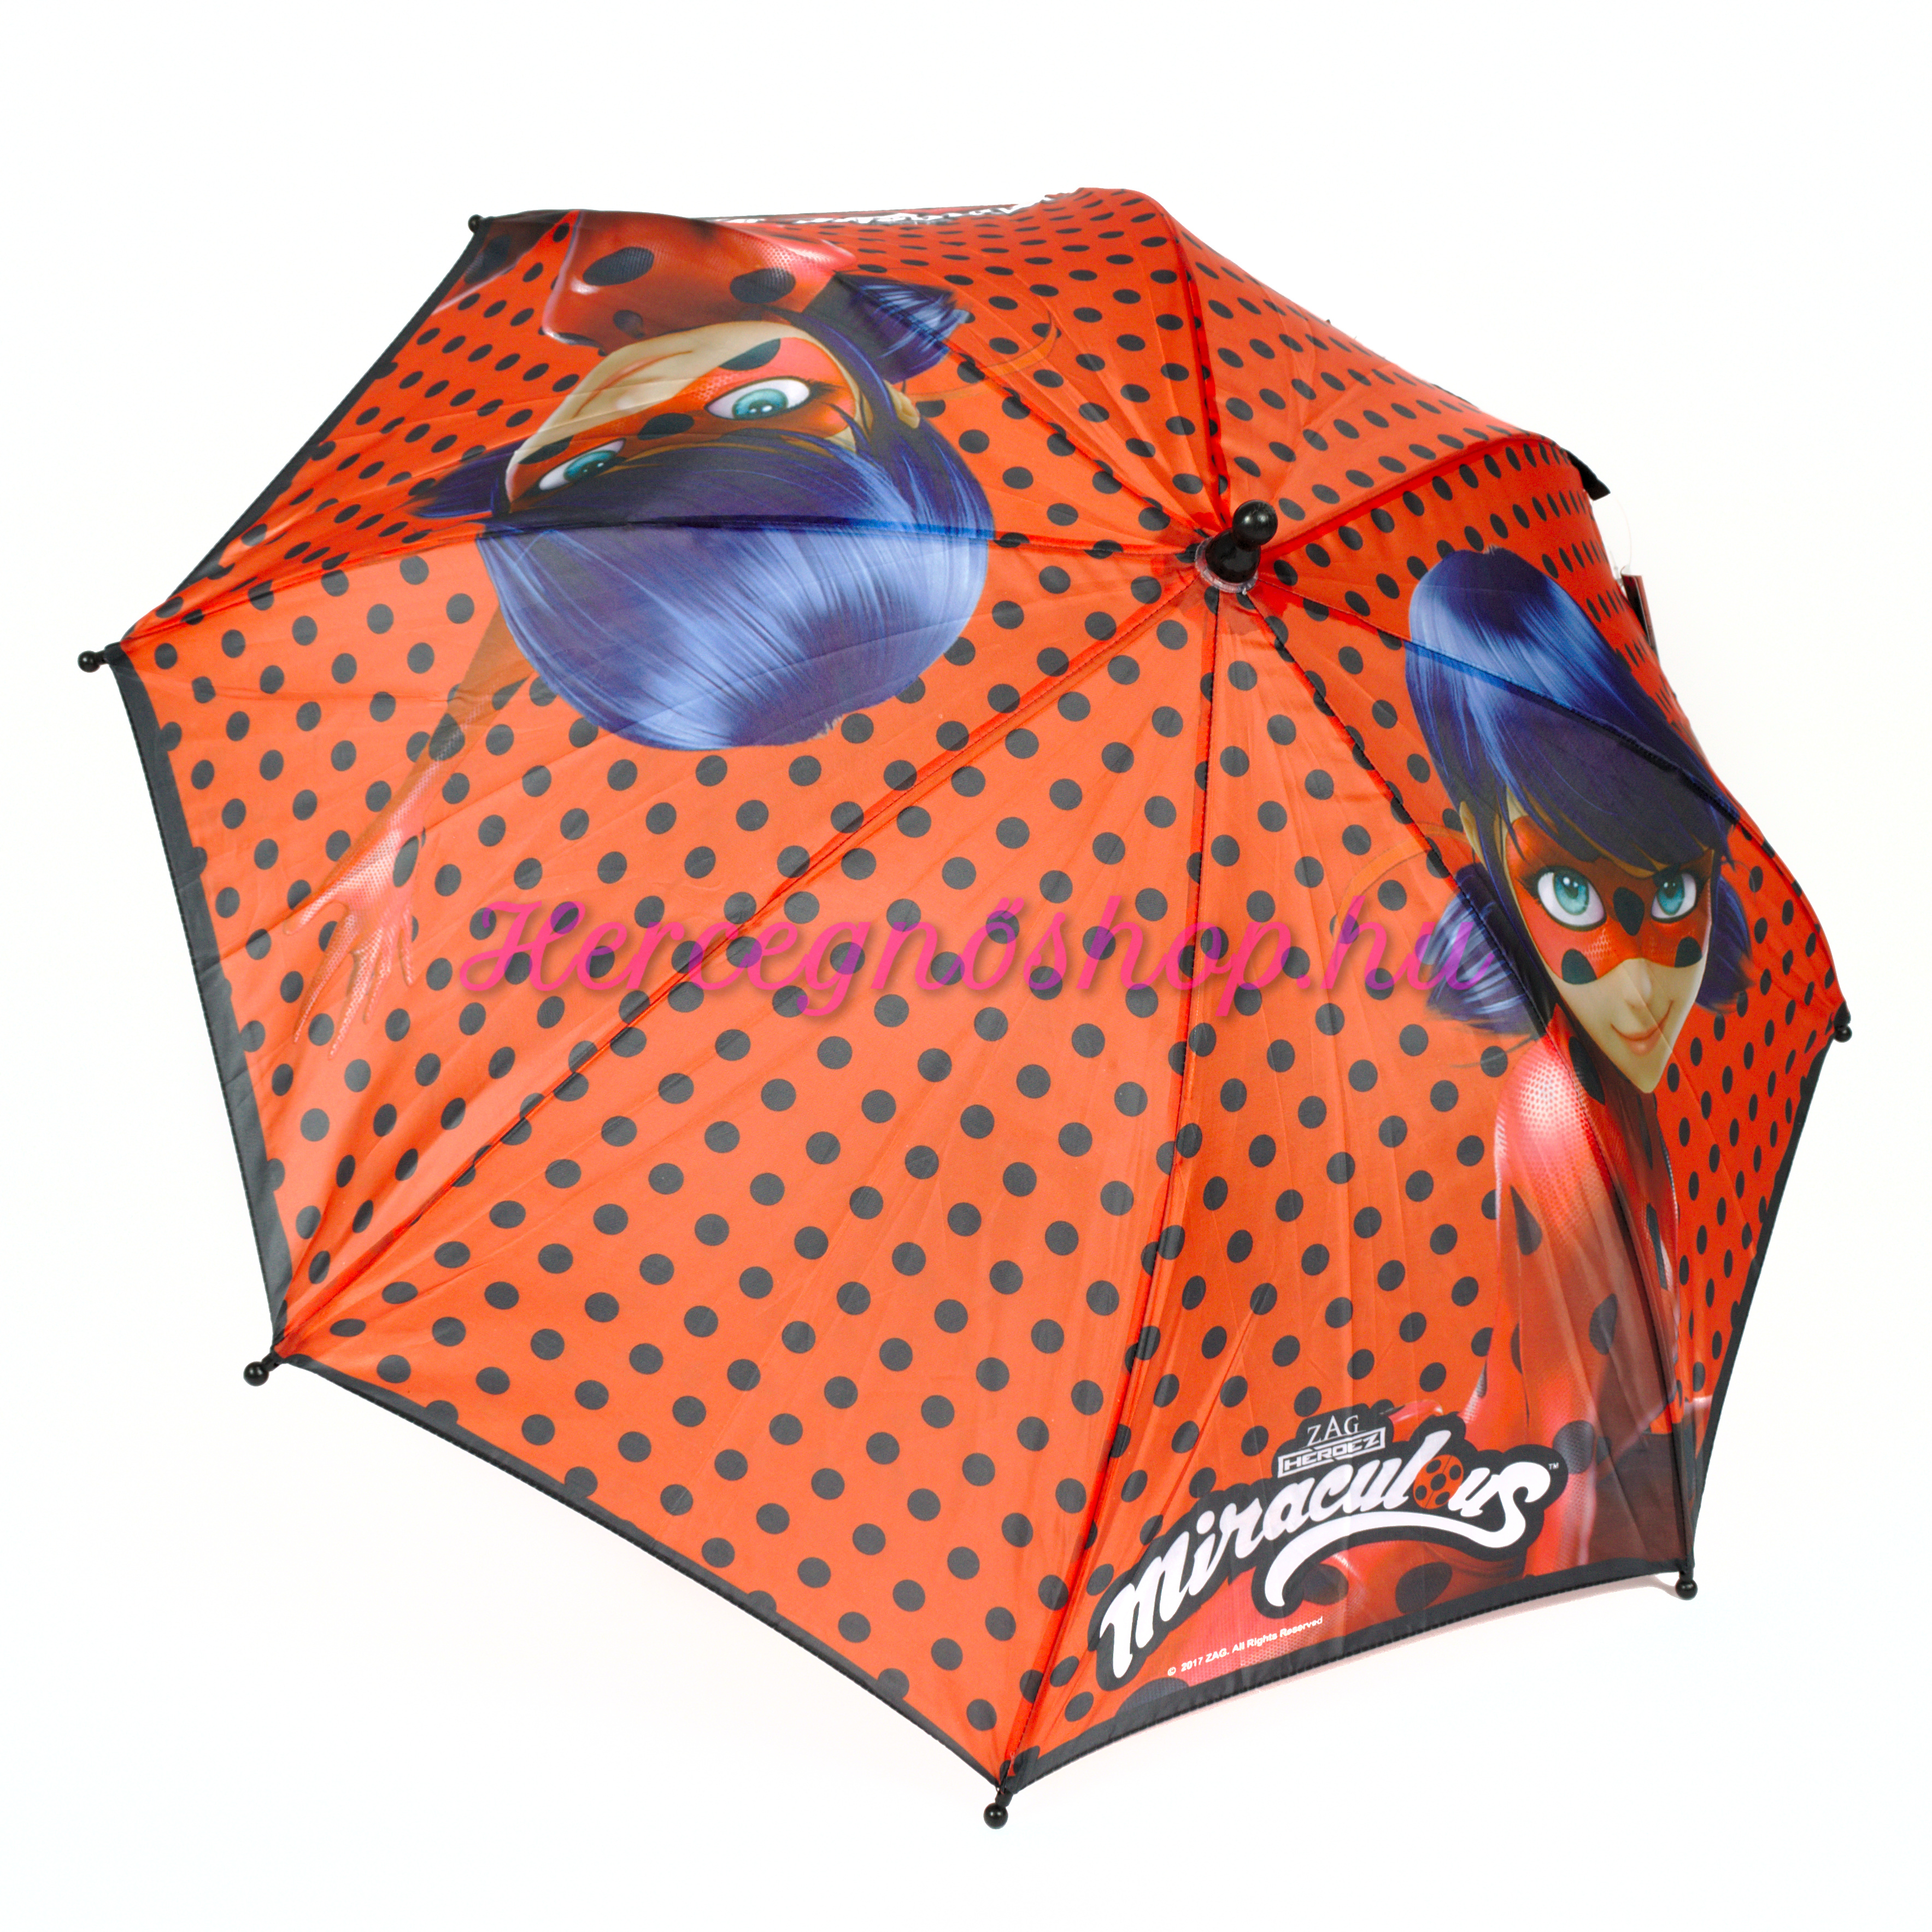 Karica rugós esernyő (Miraculous Ladybug)